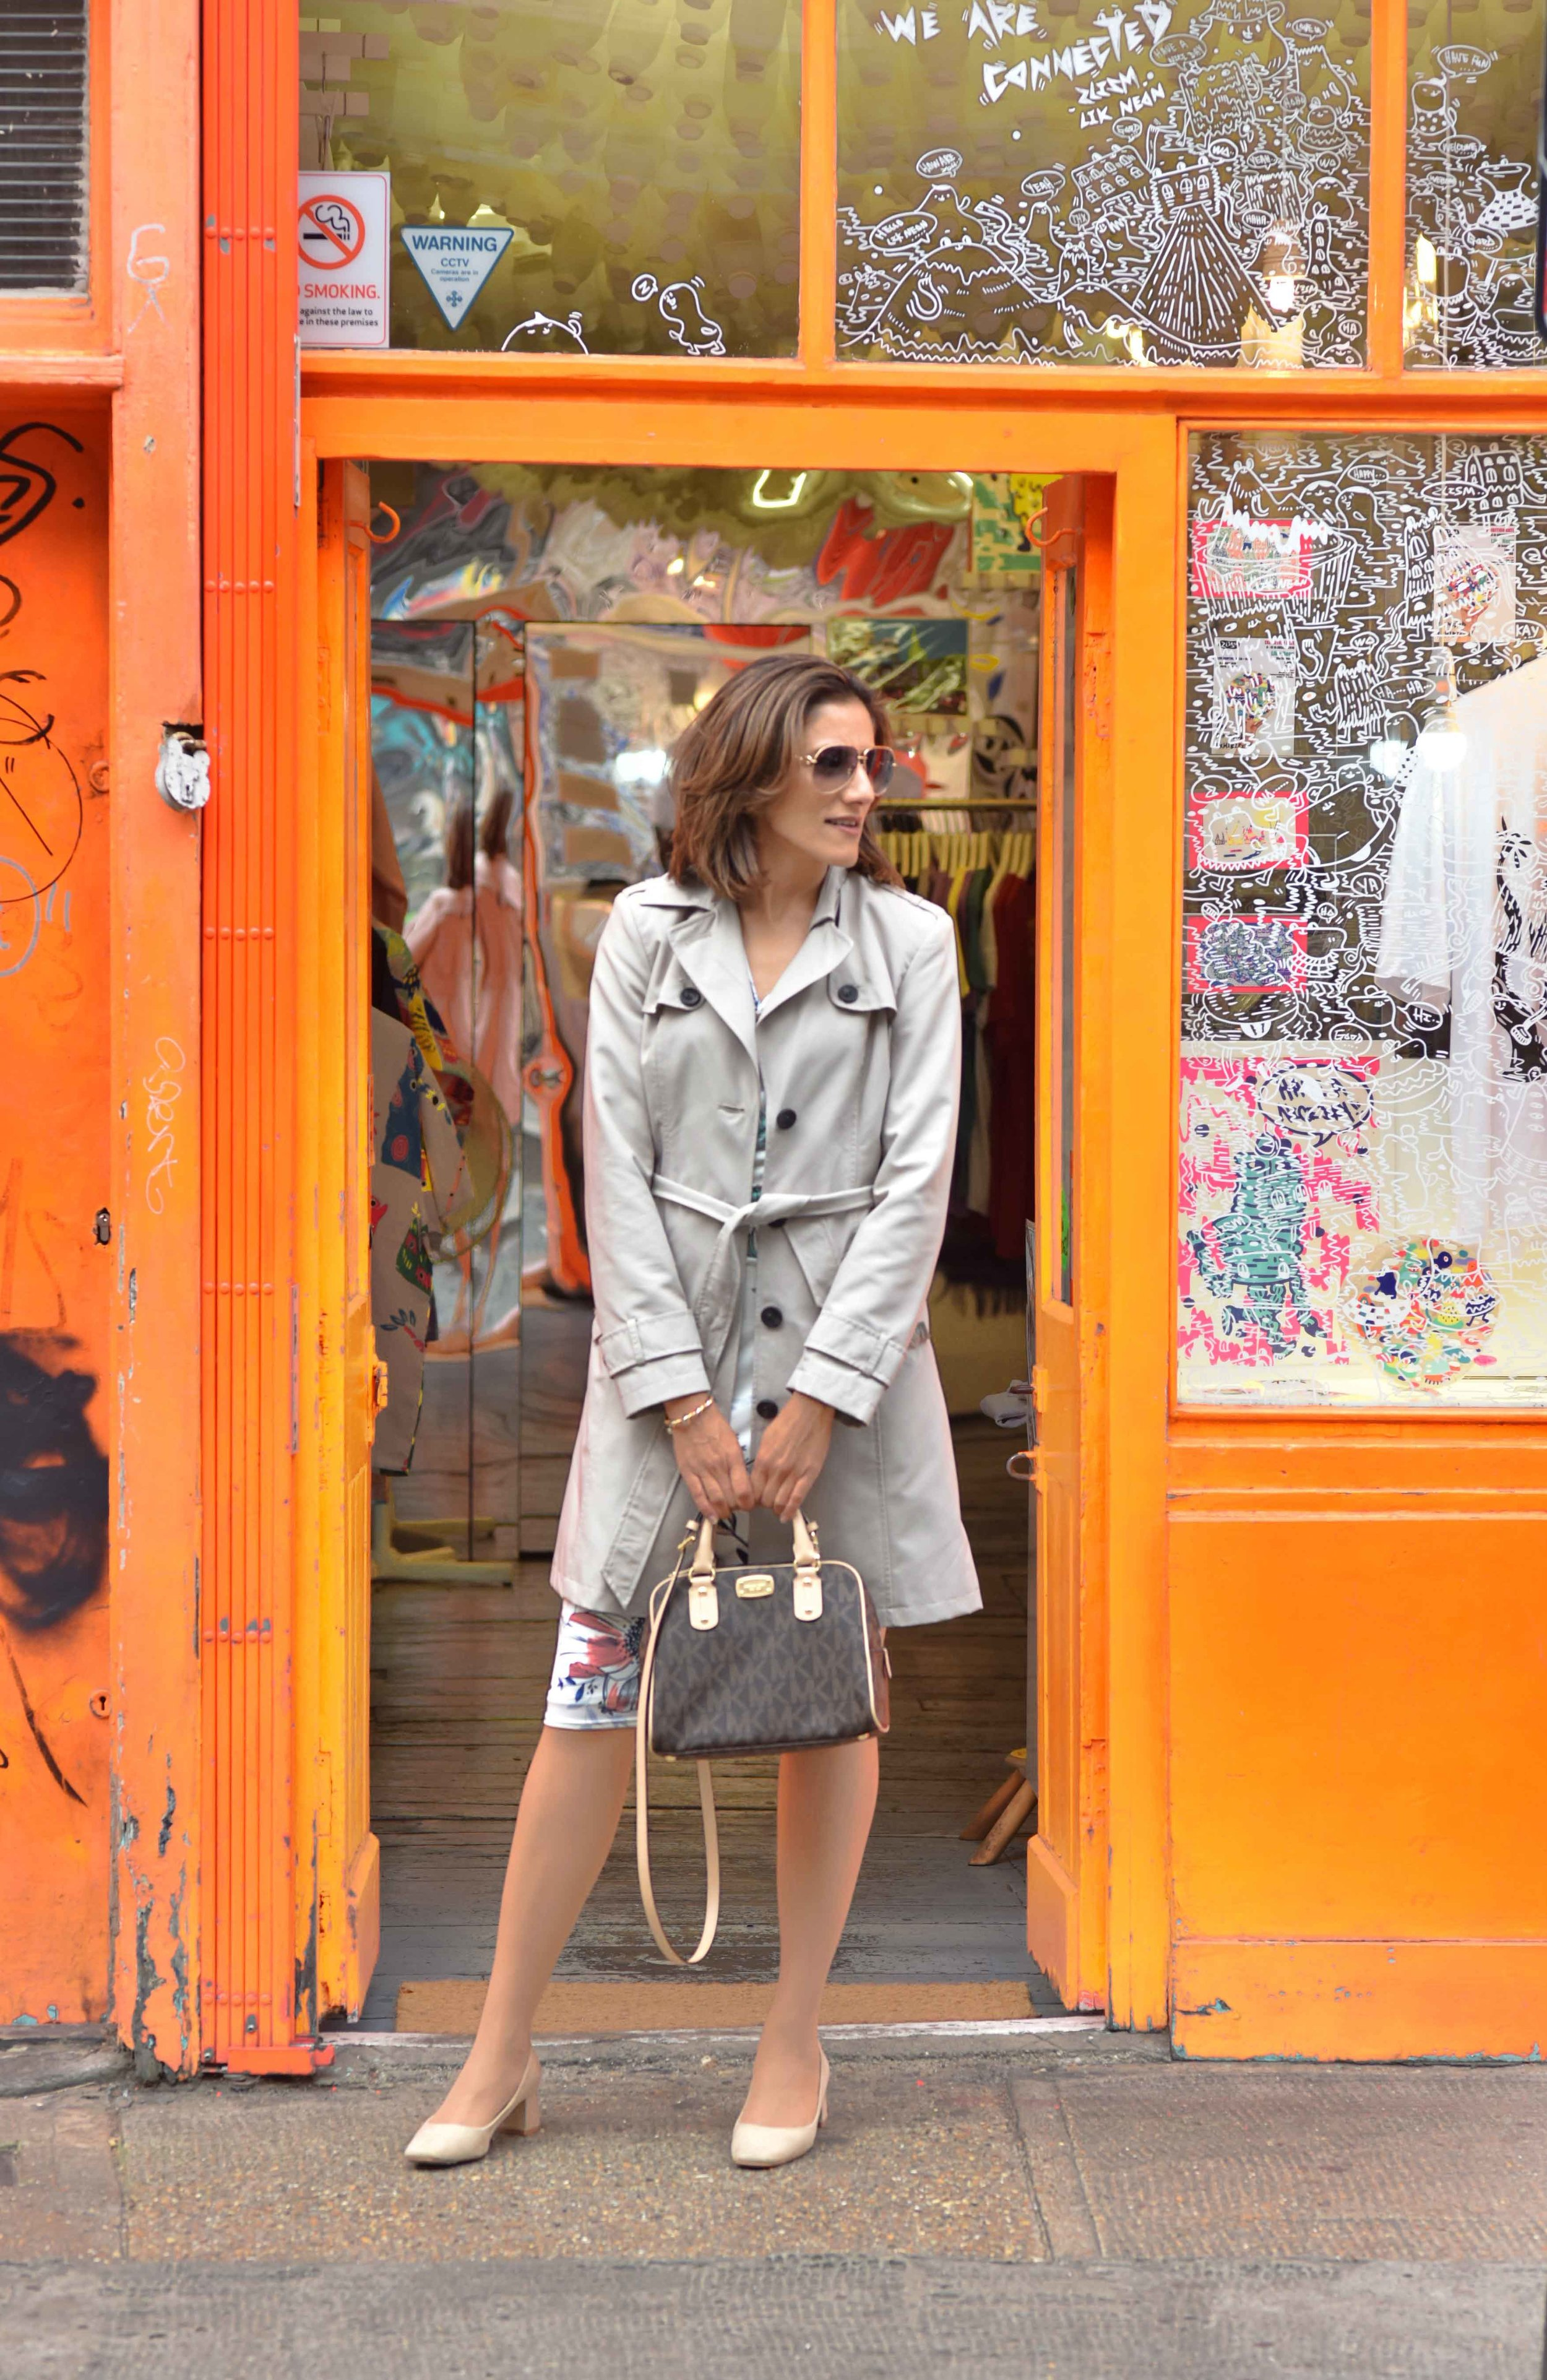 Marks and Spencer shift dress, Marks and Spencer trench, Gucci sunglasses, Michael Kors handbag, Zara sandals, Shoreditch, London, U.K. Photo: Nina Shaw, Image©sourcingstyle.com